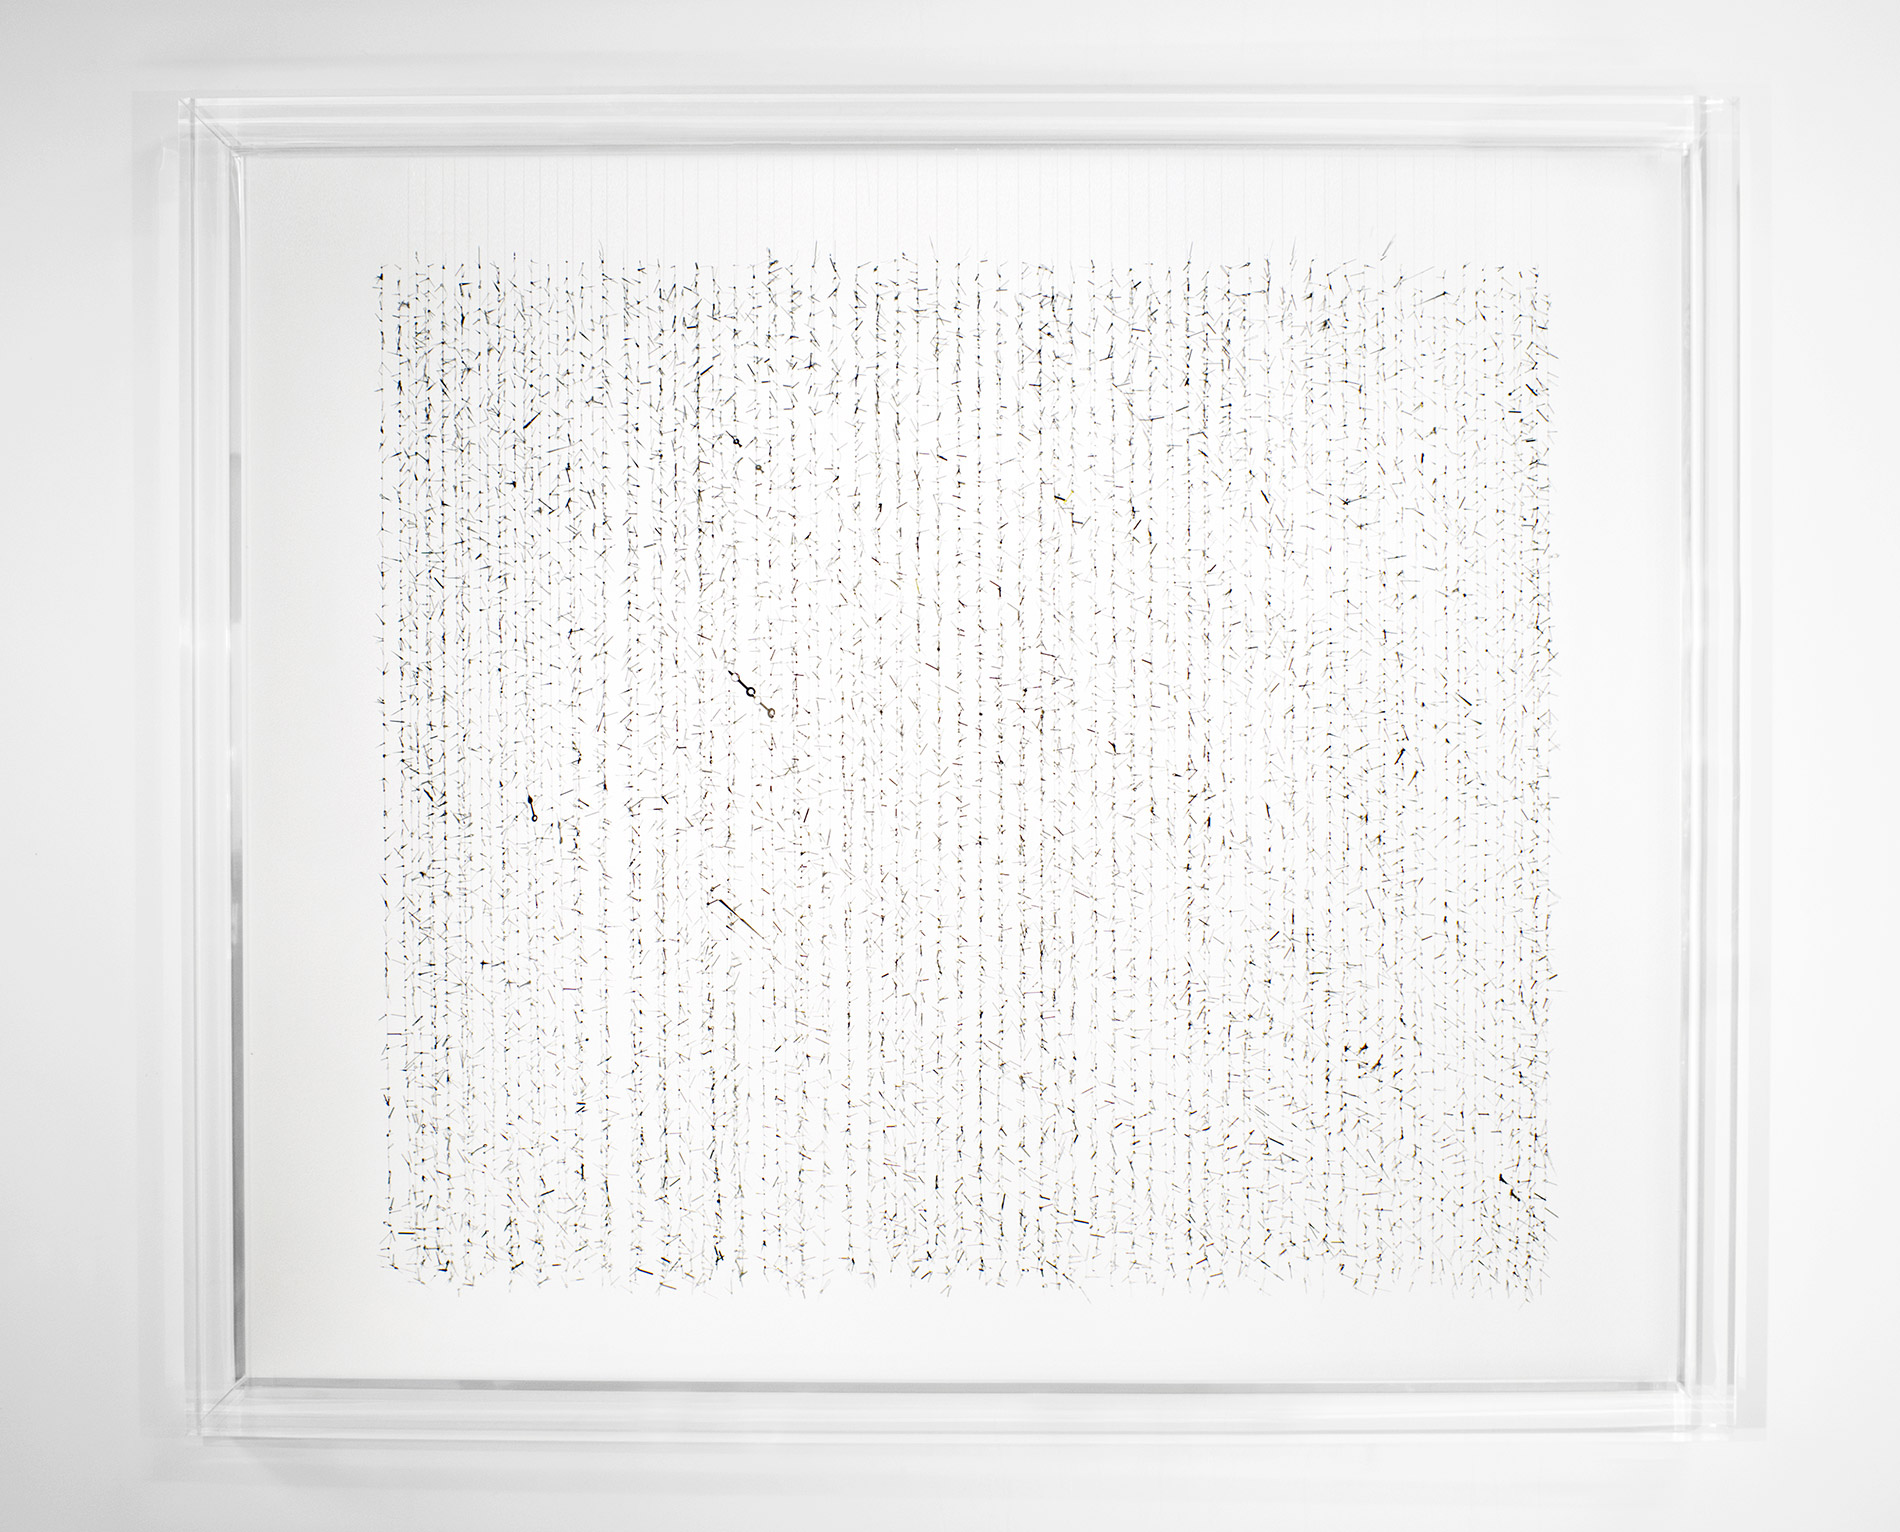 4-GUGLIELMETTI_TRILOGIE_CREPUSCULEA-galerie-bettina-art-contemporain-paris